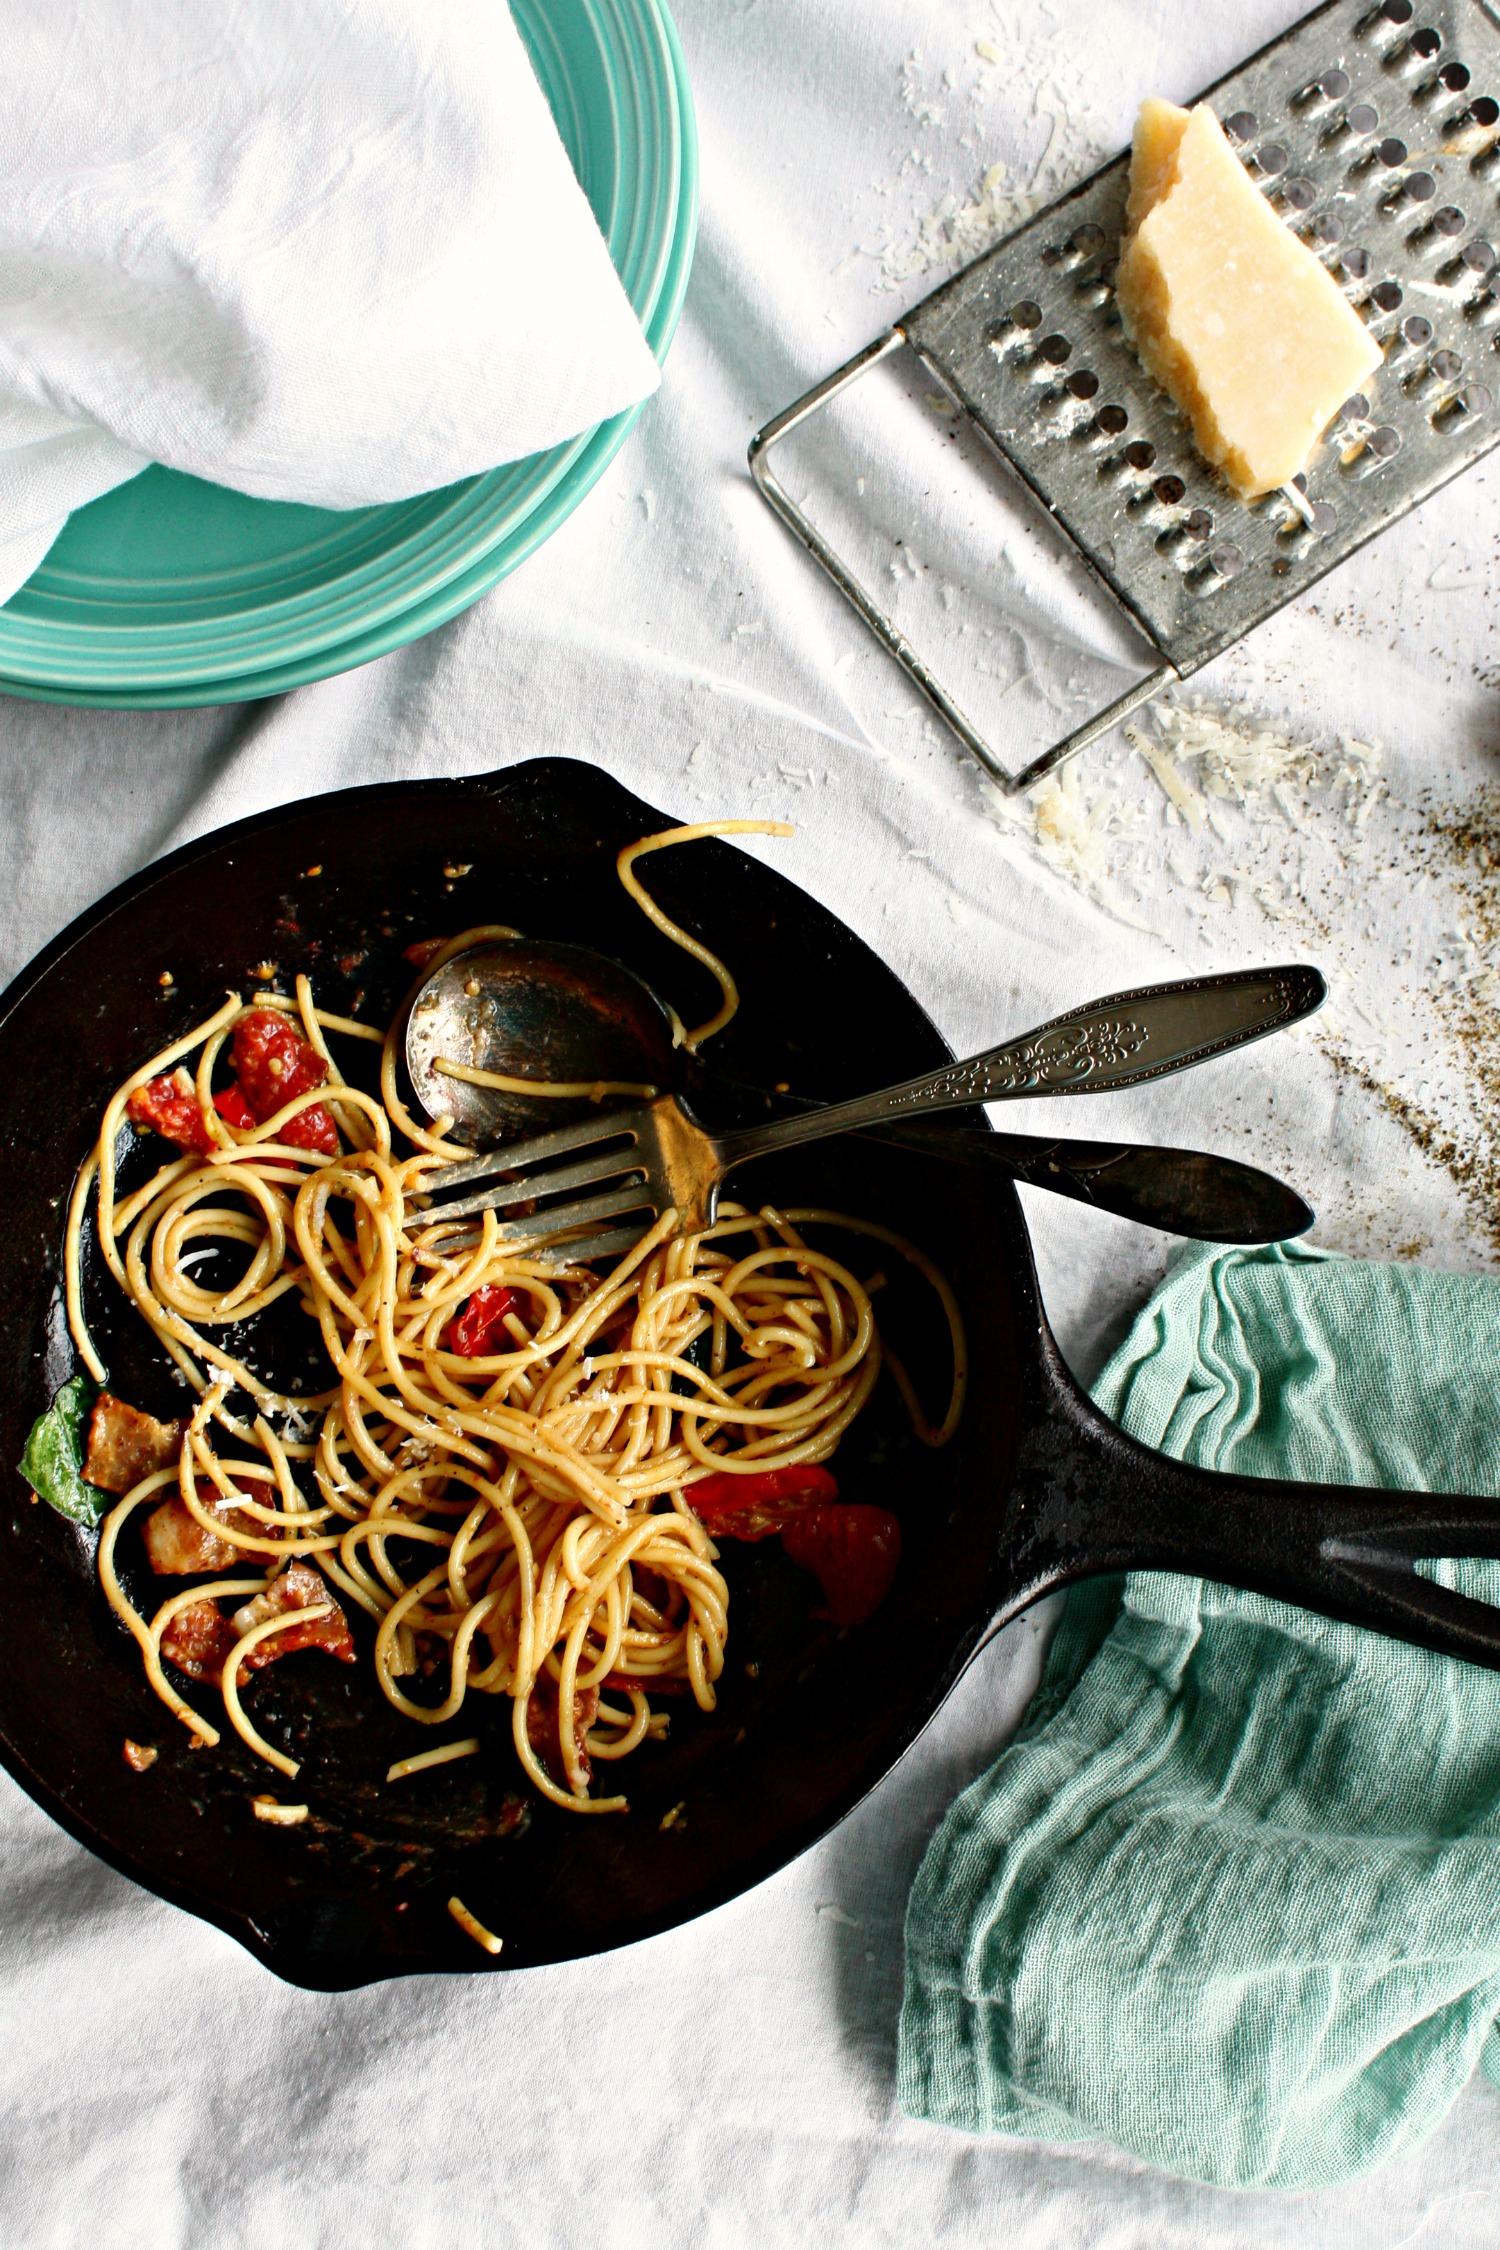 spaghetti carbonara eaten